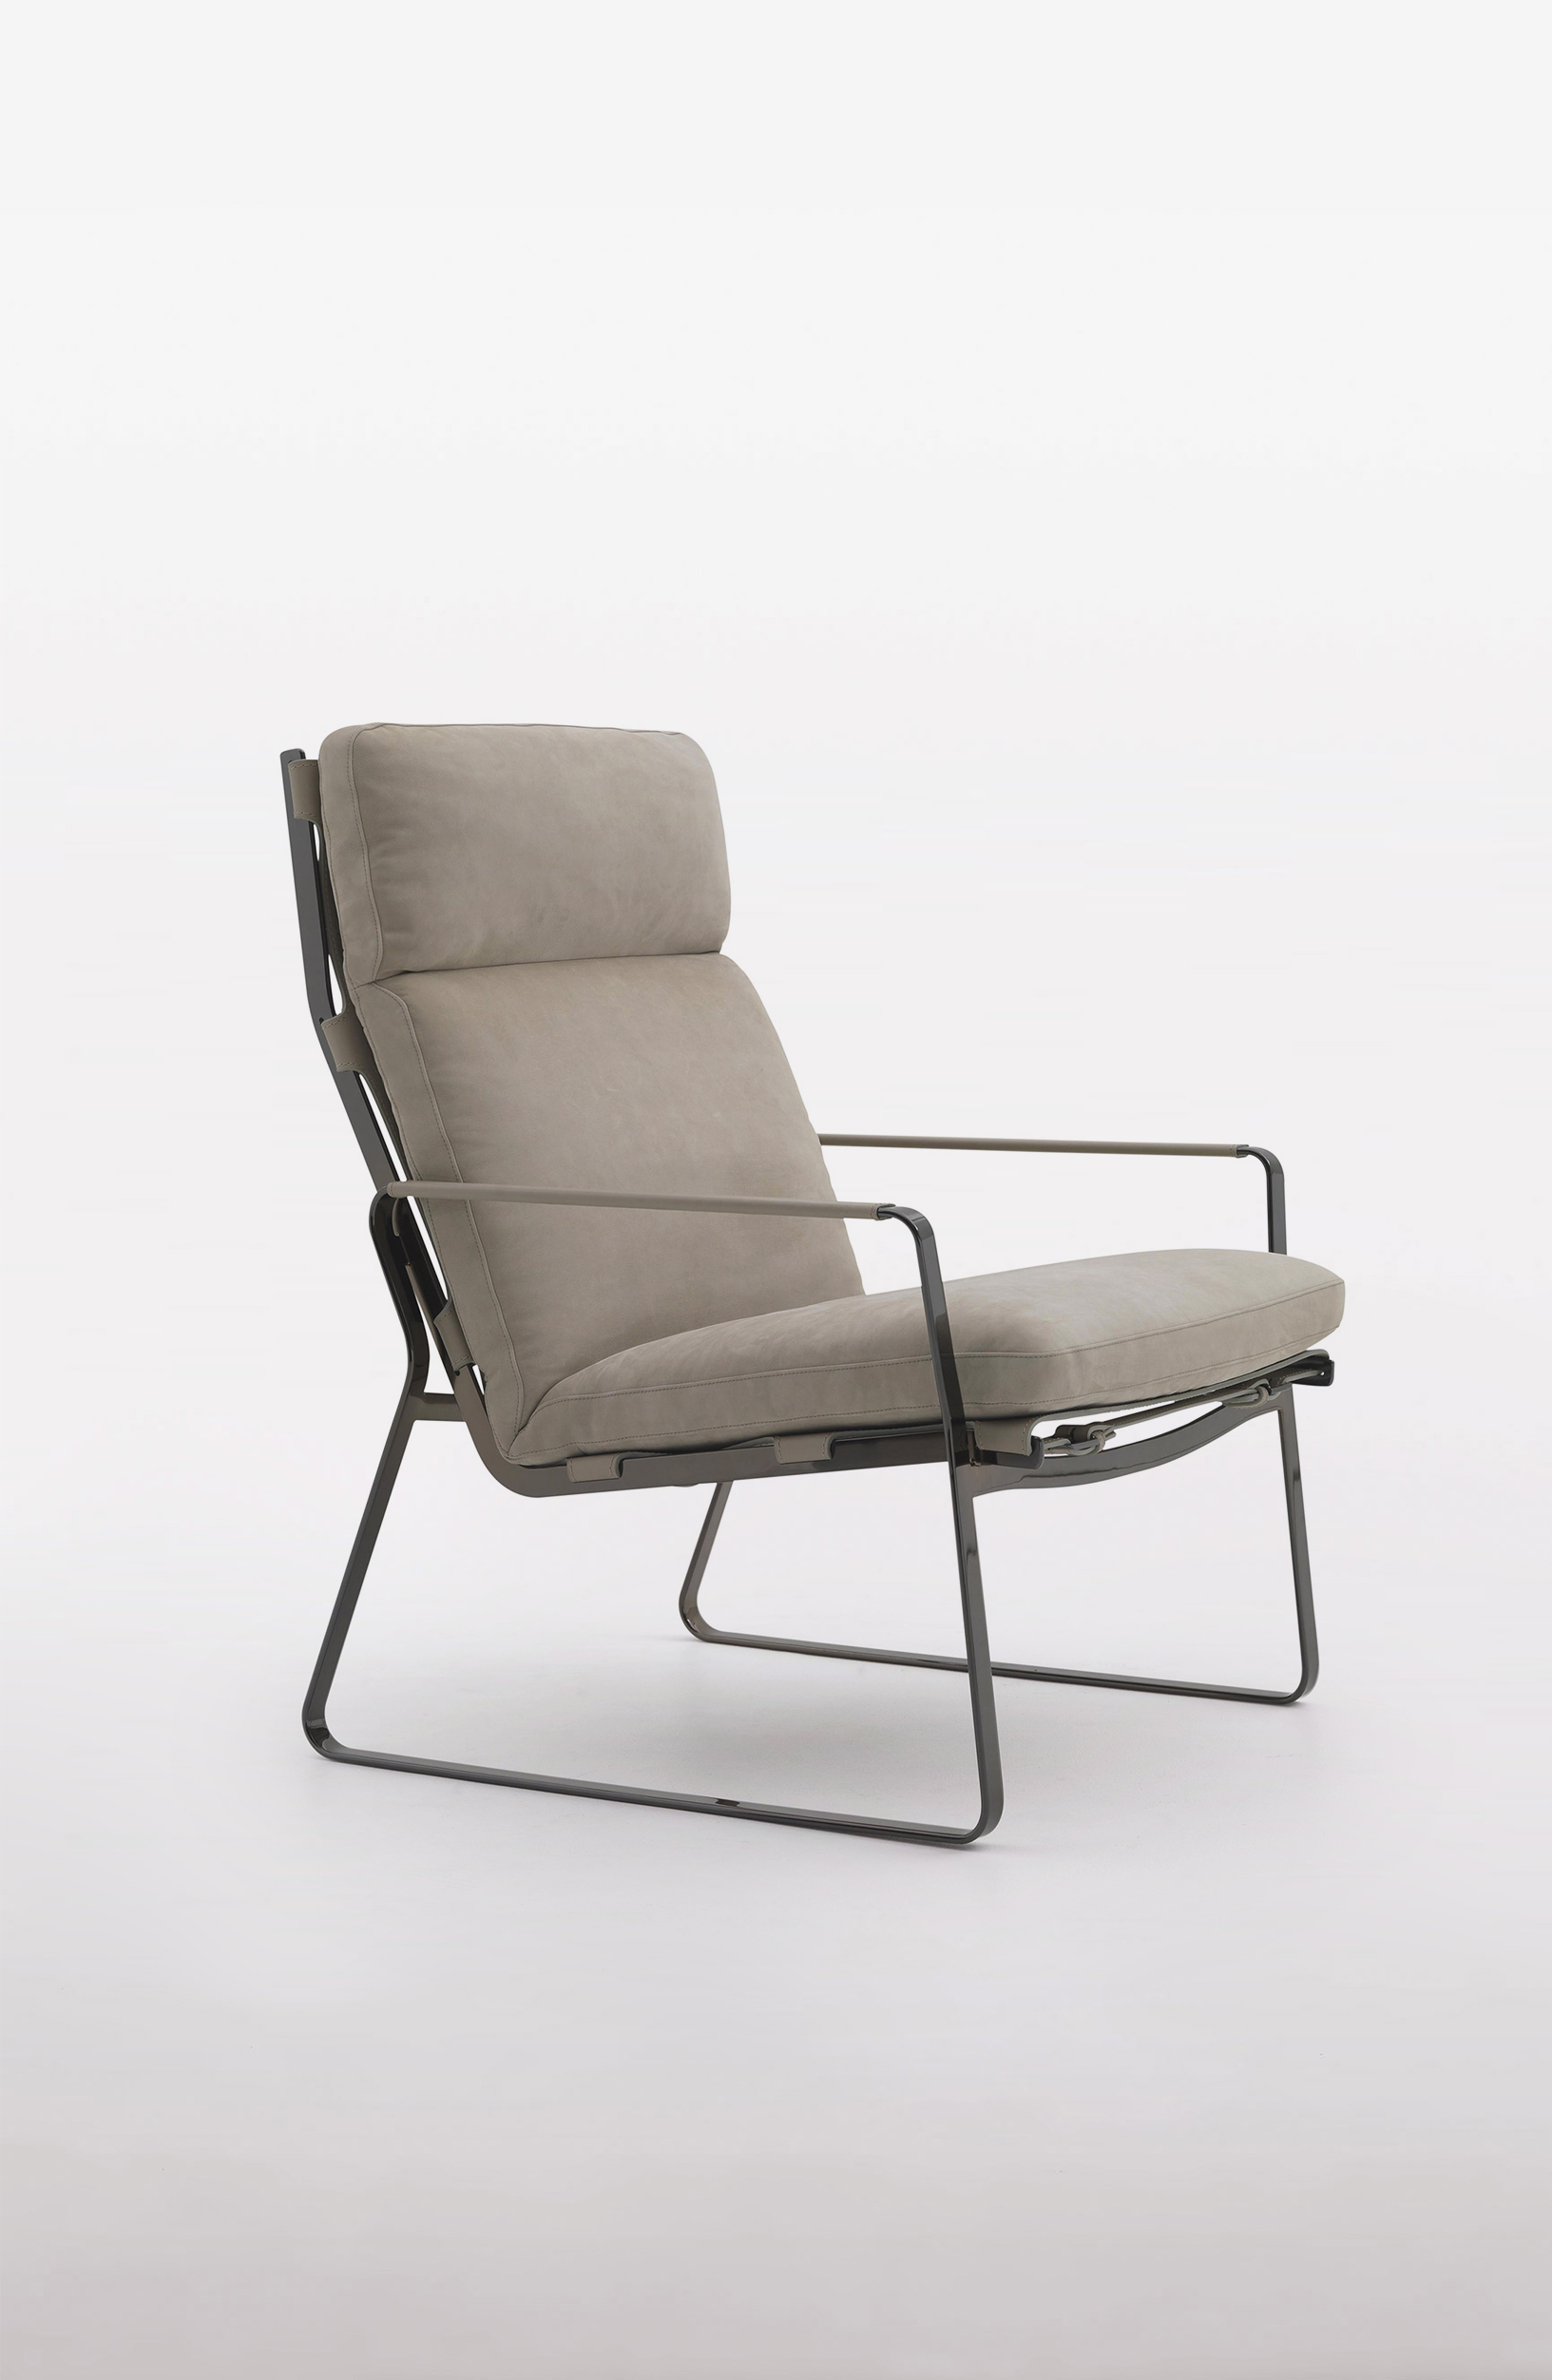 fendi_casa-blixen_armchair-04